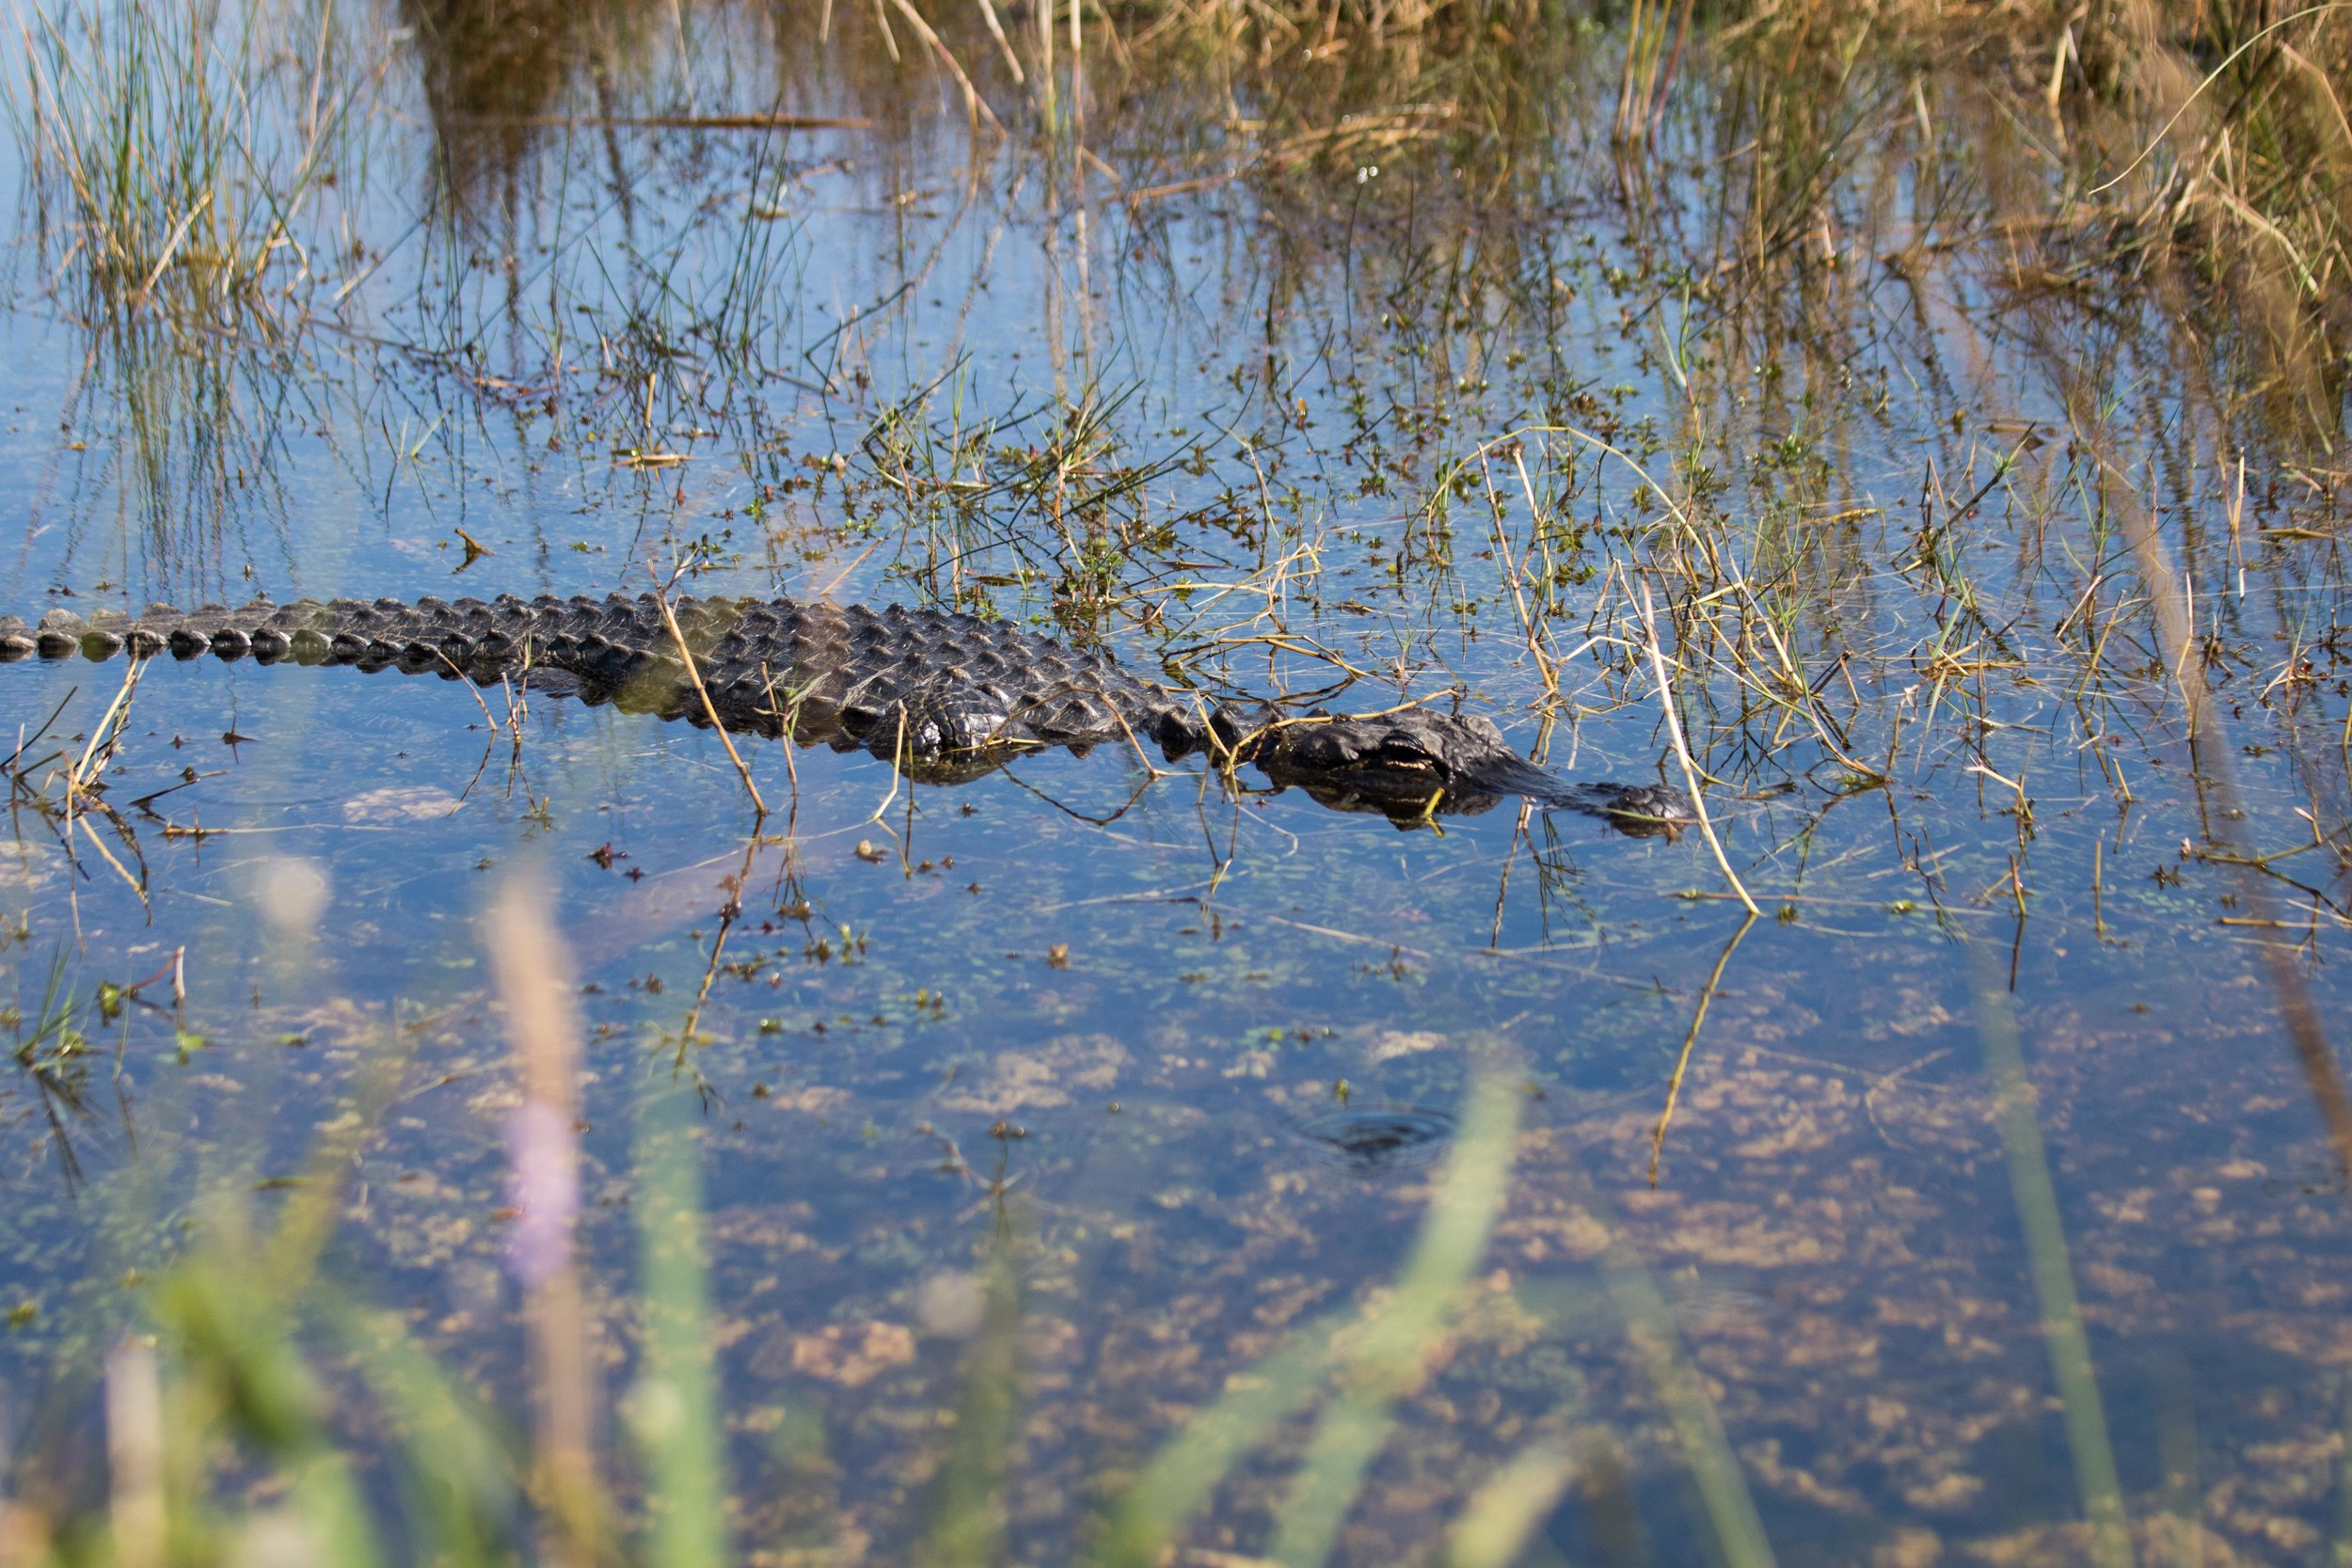 2019_Everglades-206.jpg